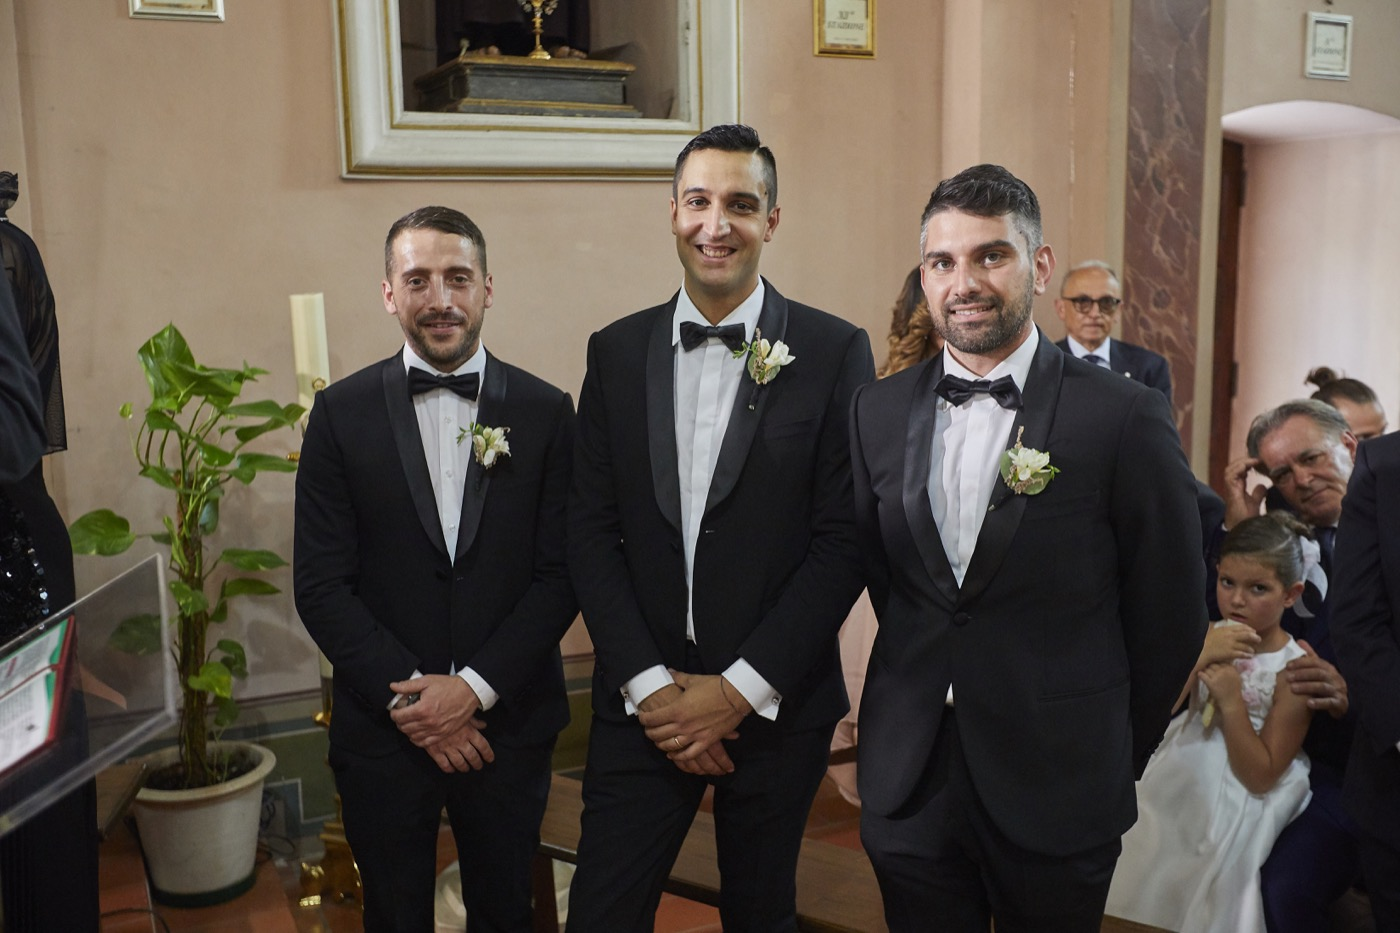 Claudio-Coppola-wedding-photographer-abbazia-7-frati-piegaro-52